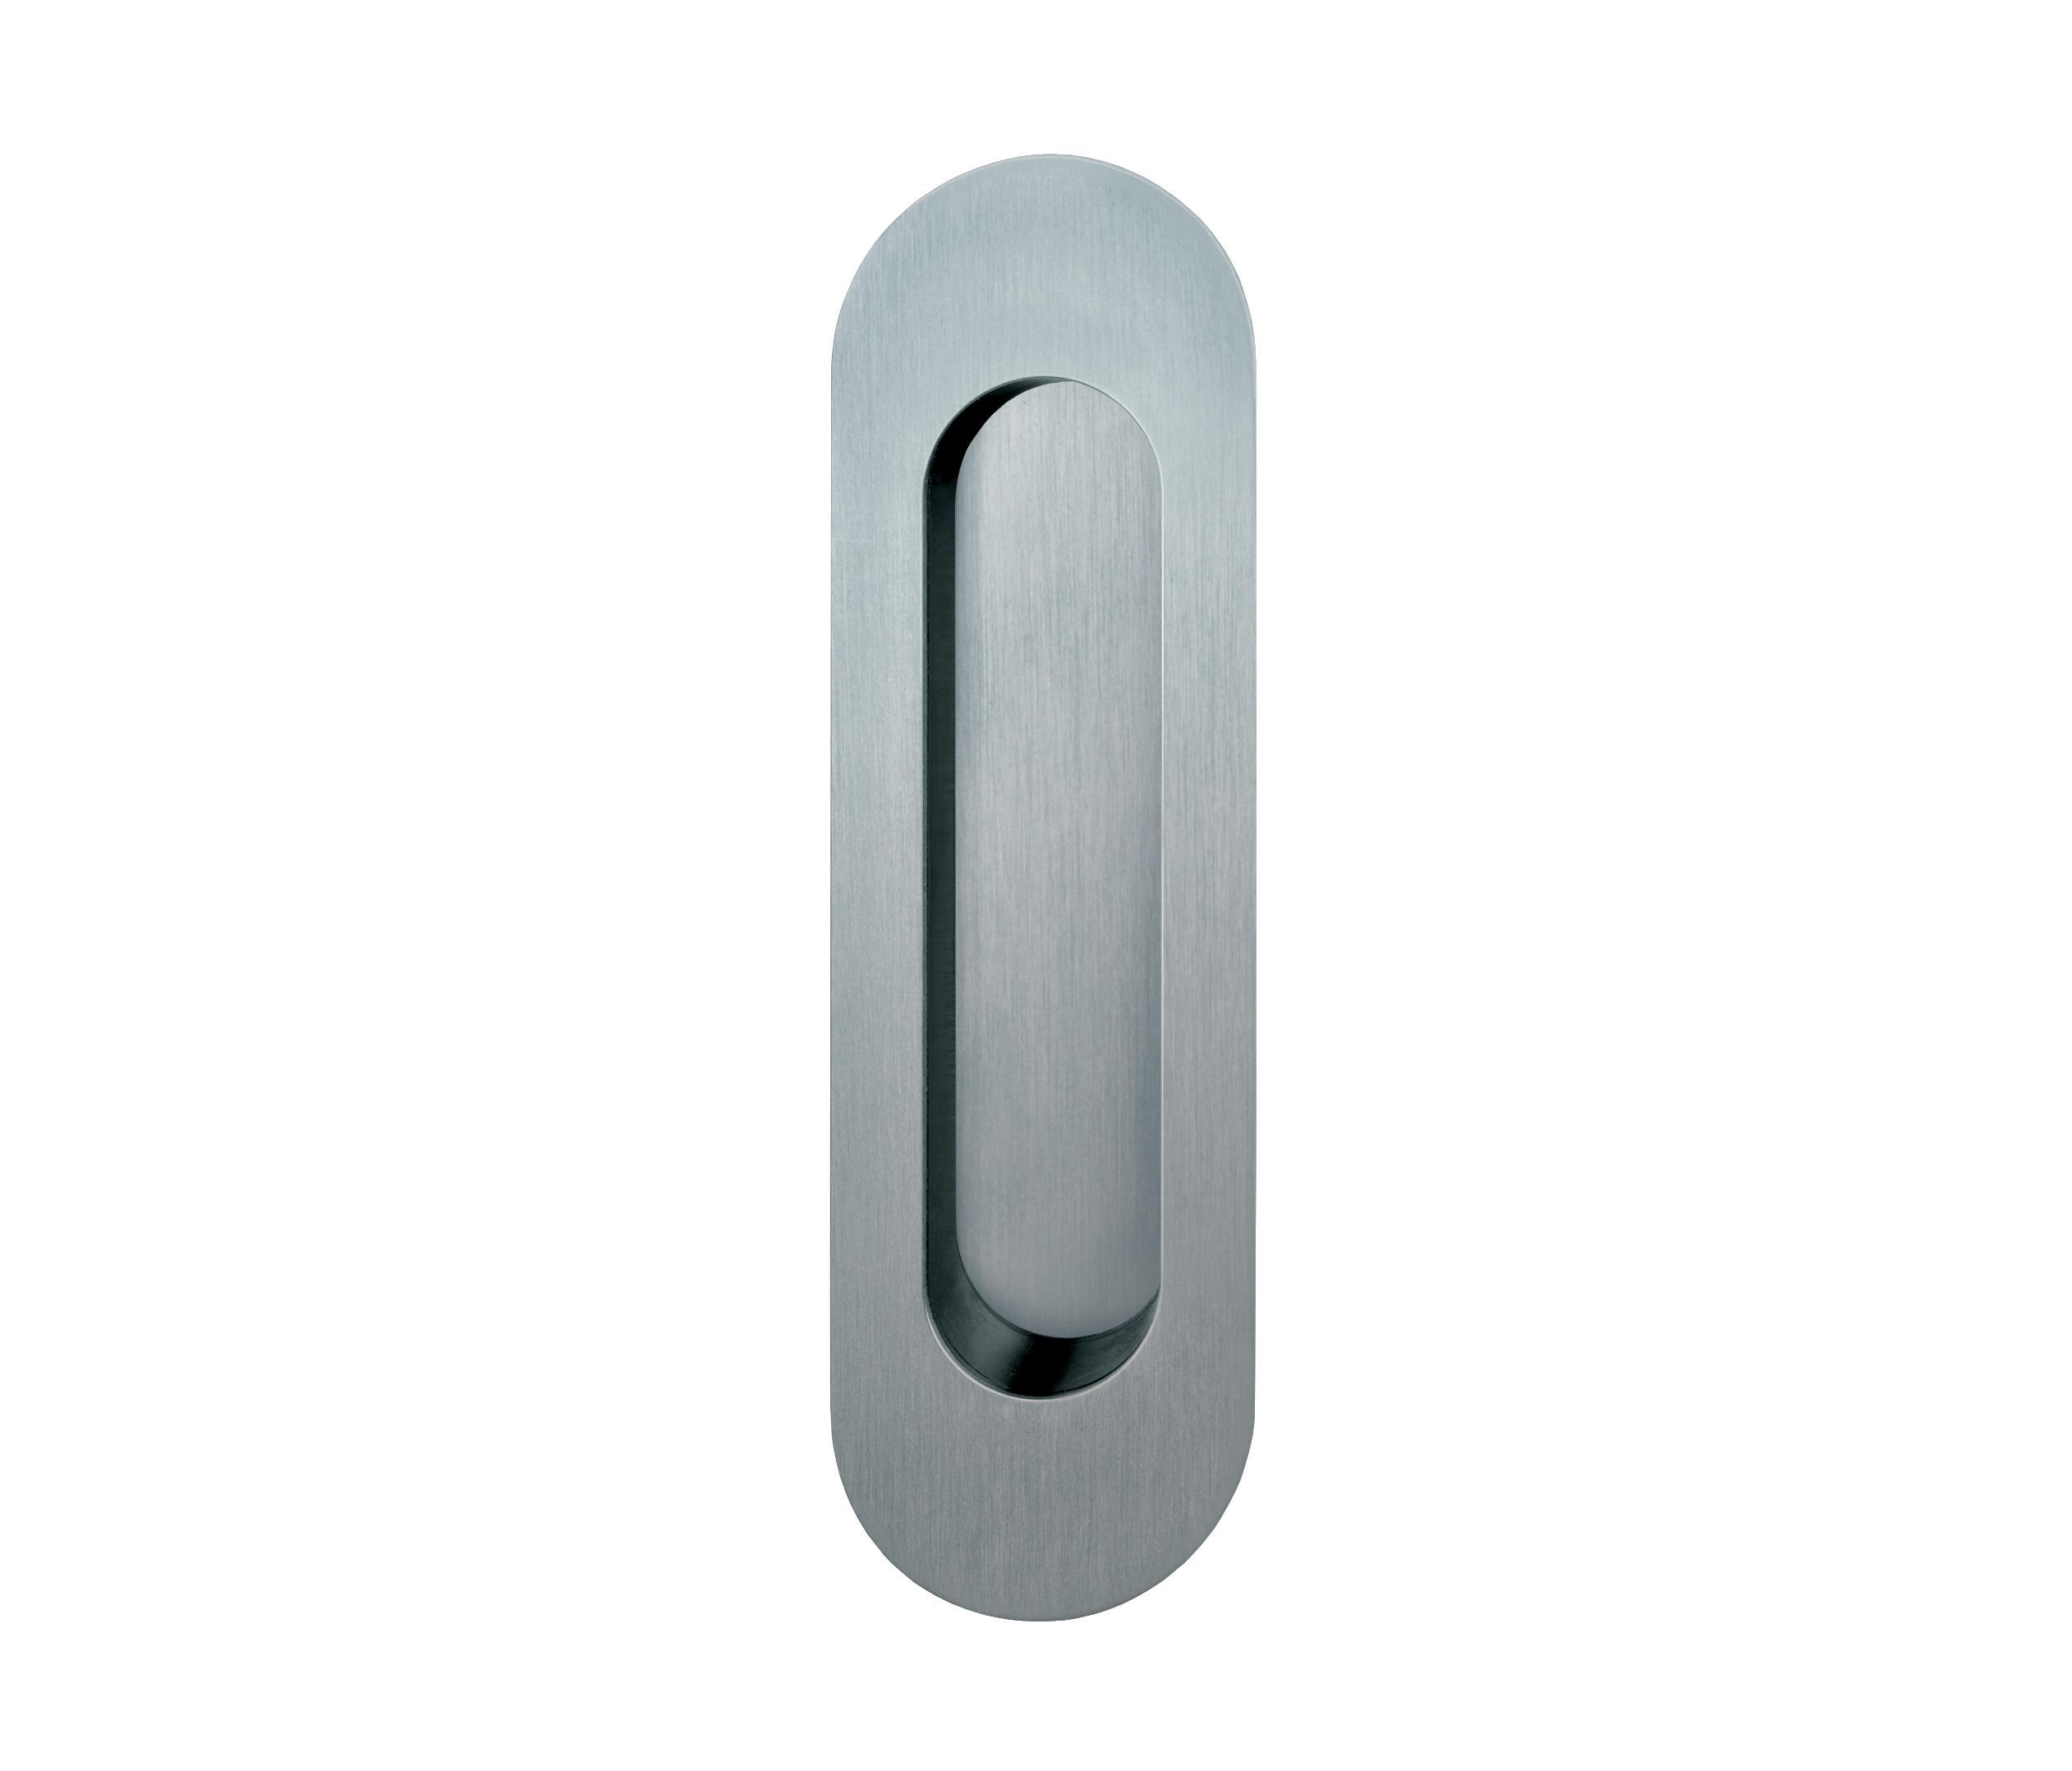 fsb 42 4250 flush pulls flush pull handles from fsb. Black Bedroom Furniture Sets. Home Design Ideas